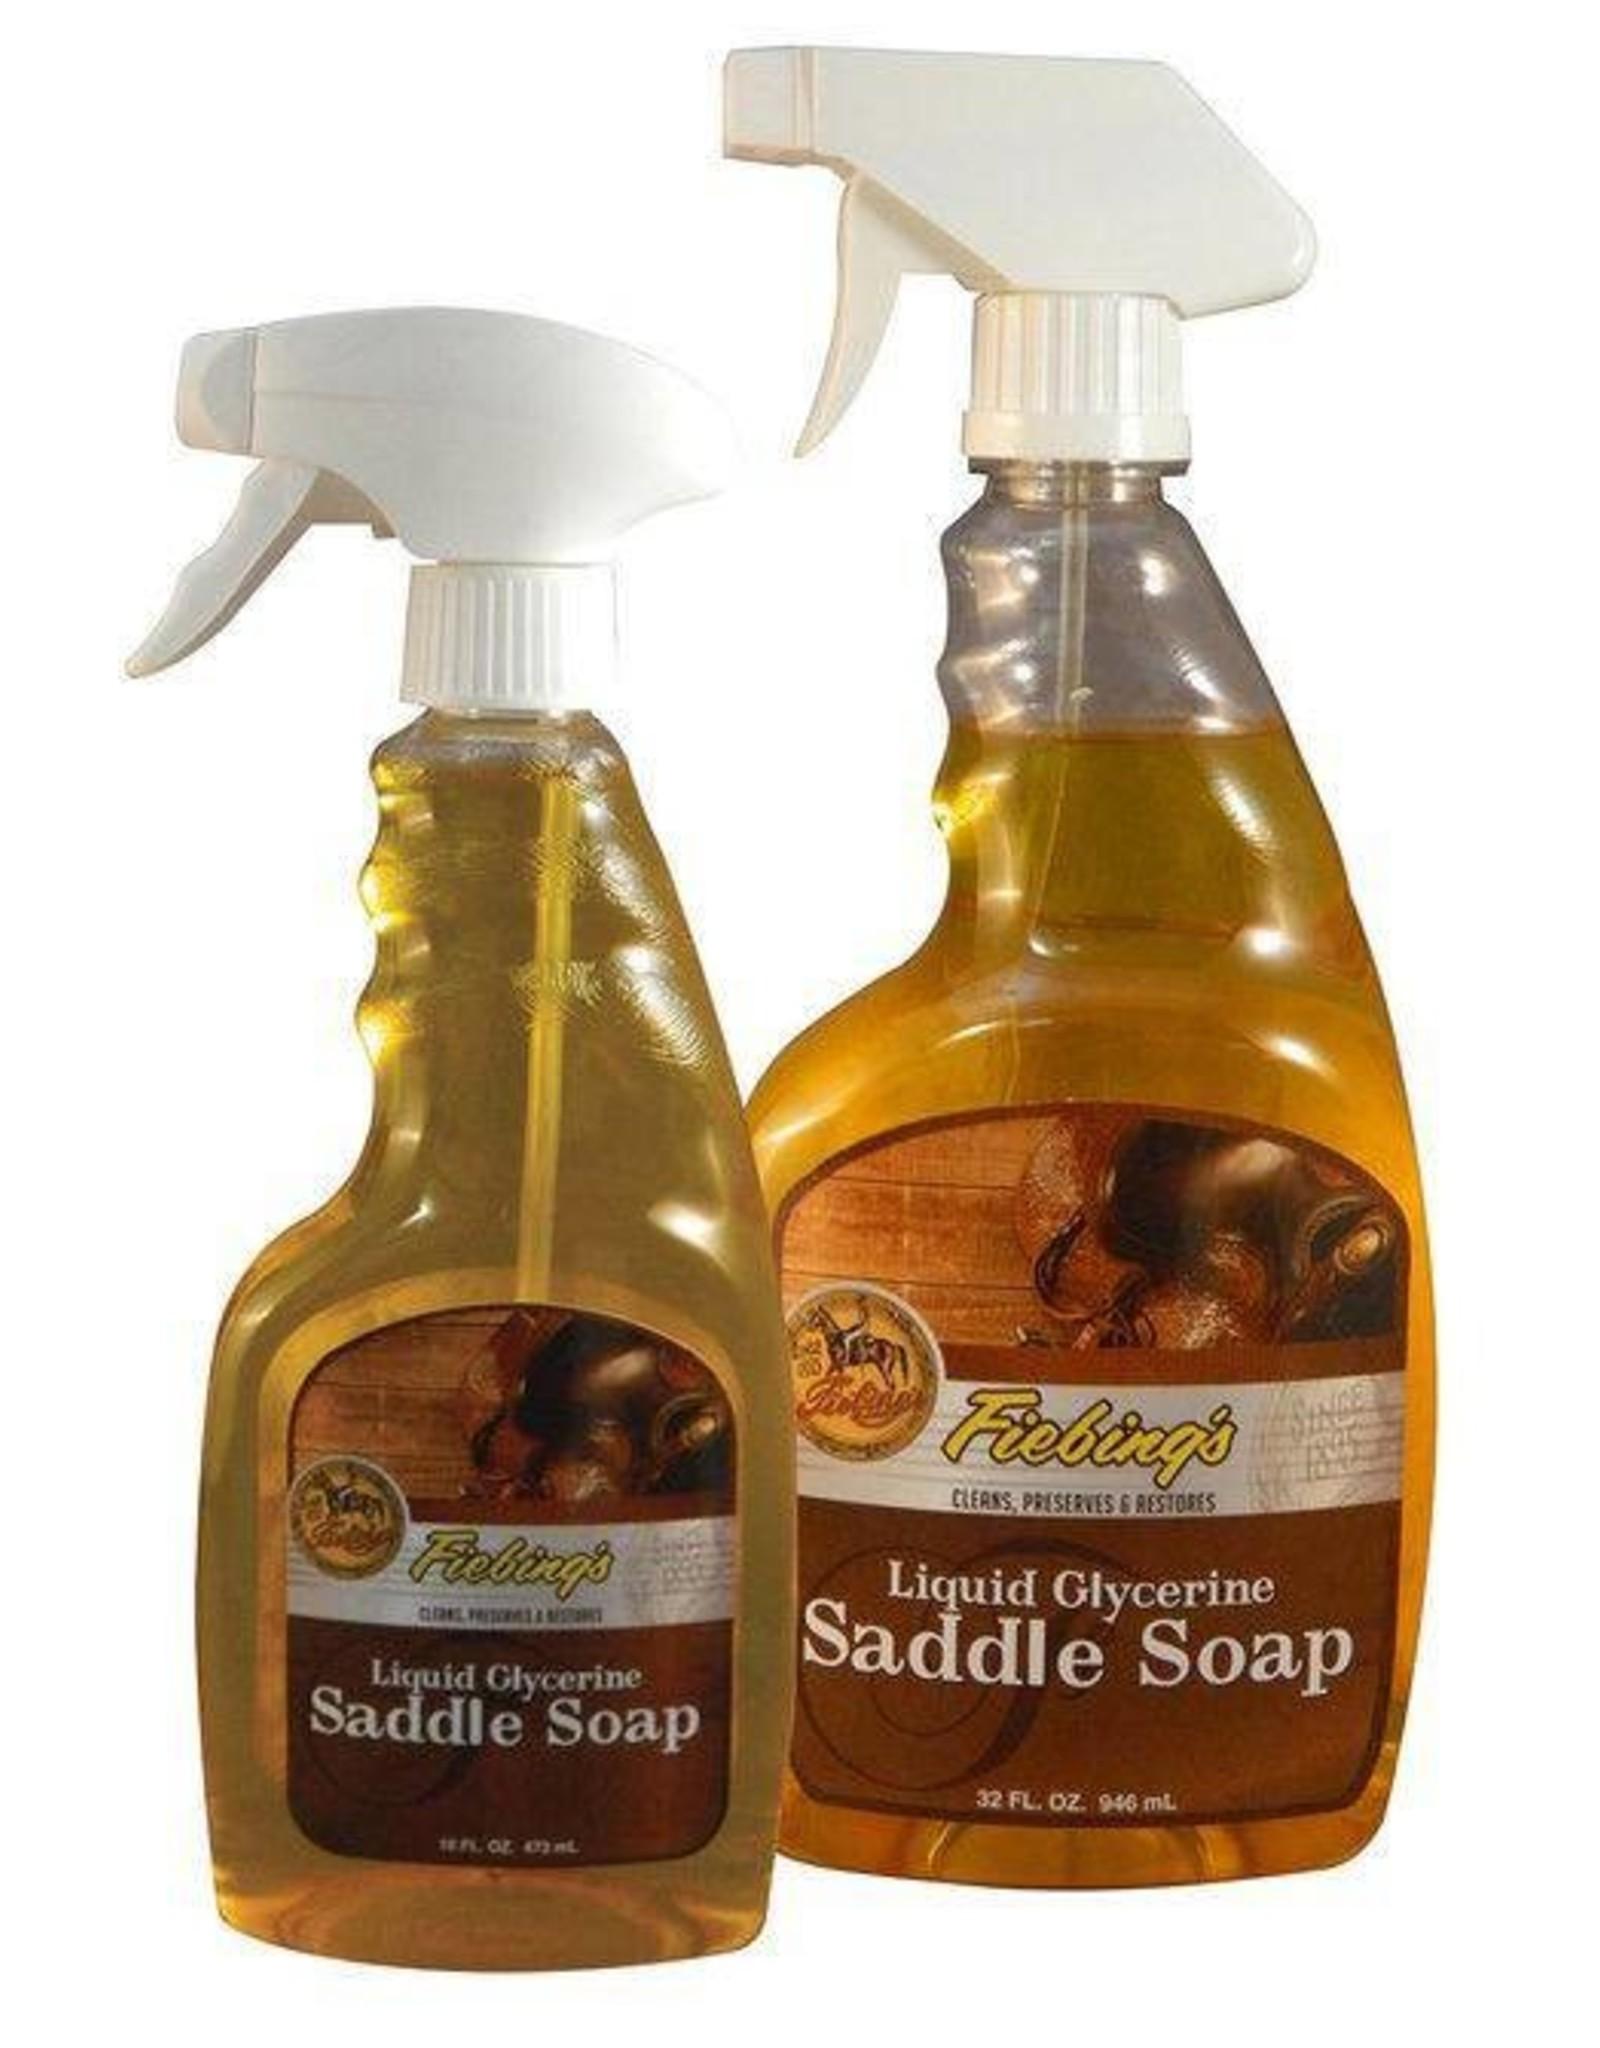 Fiebing's Liquid Glycerine Saddle Soap - 16oz